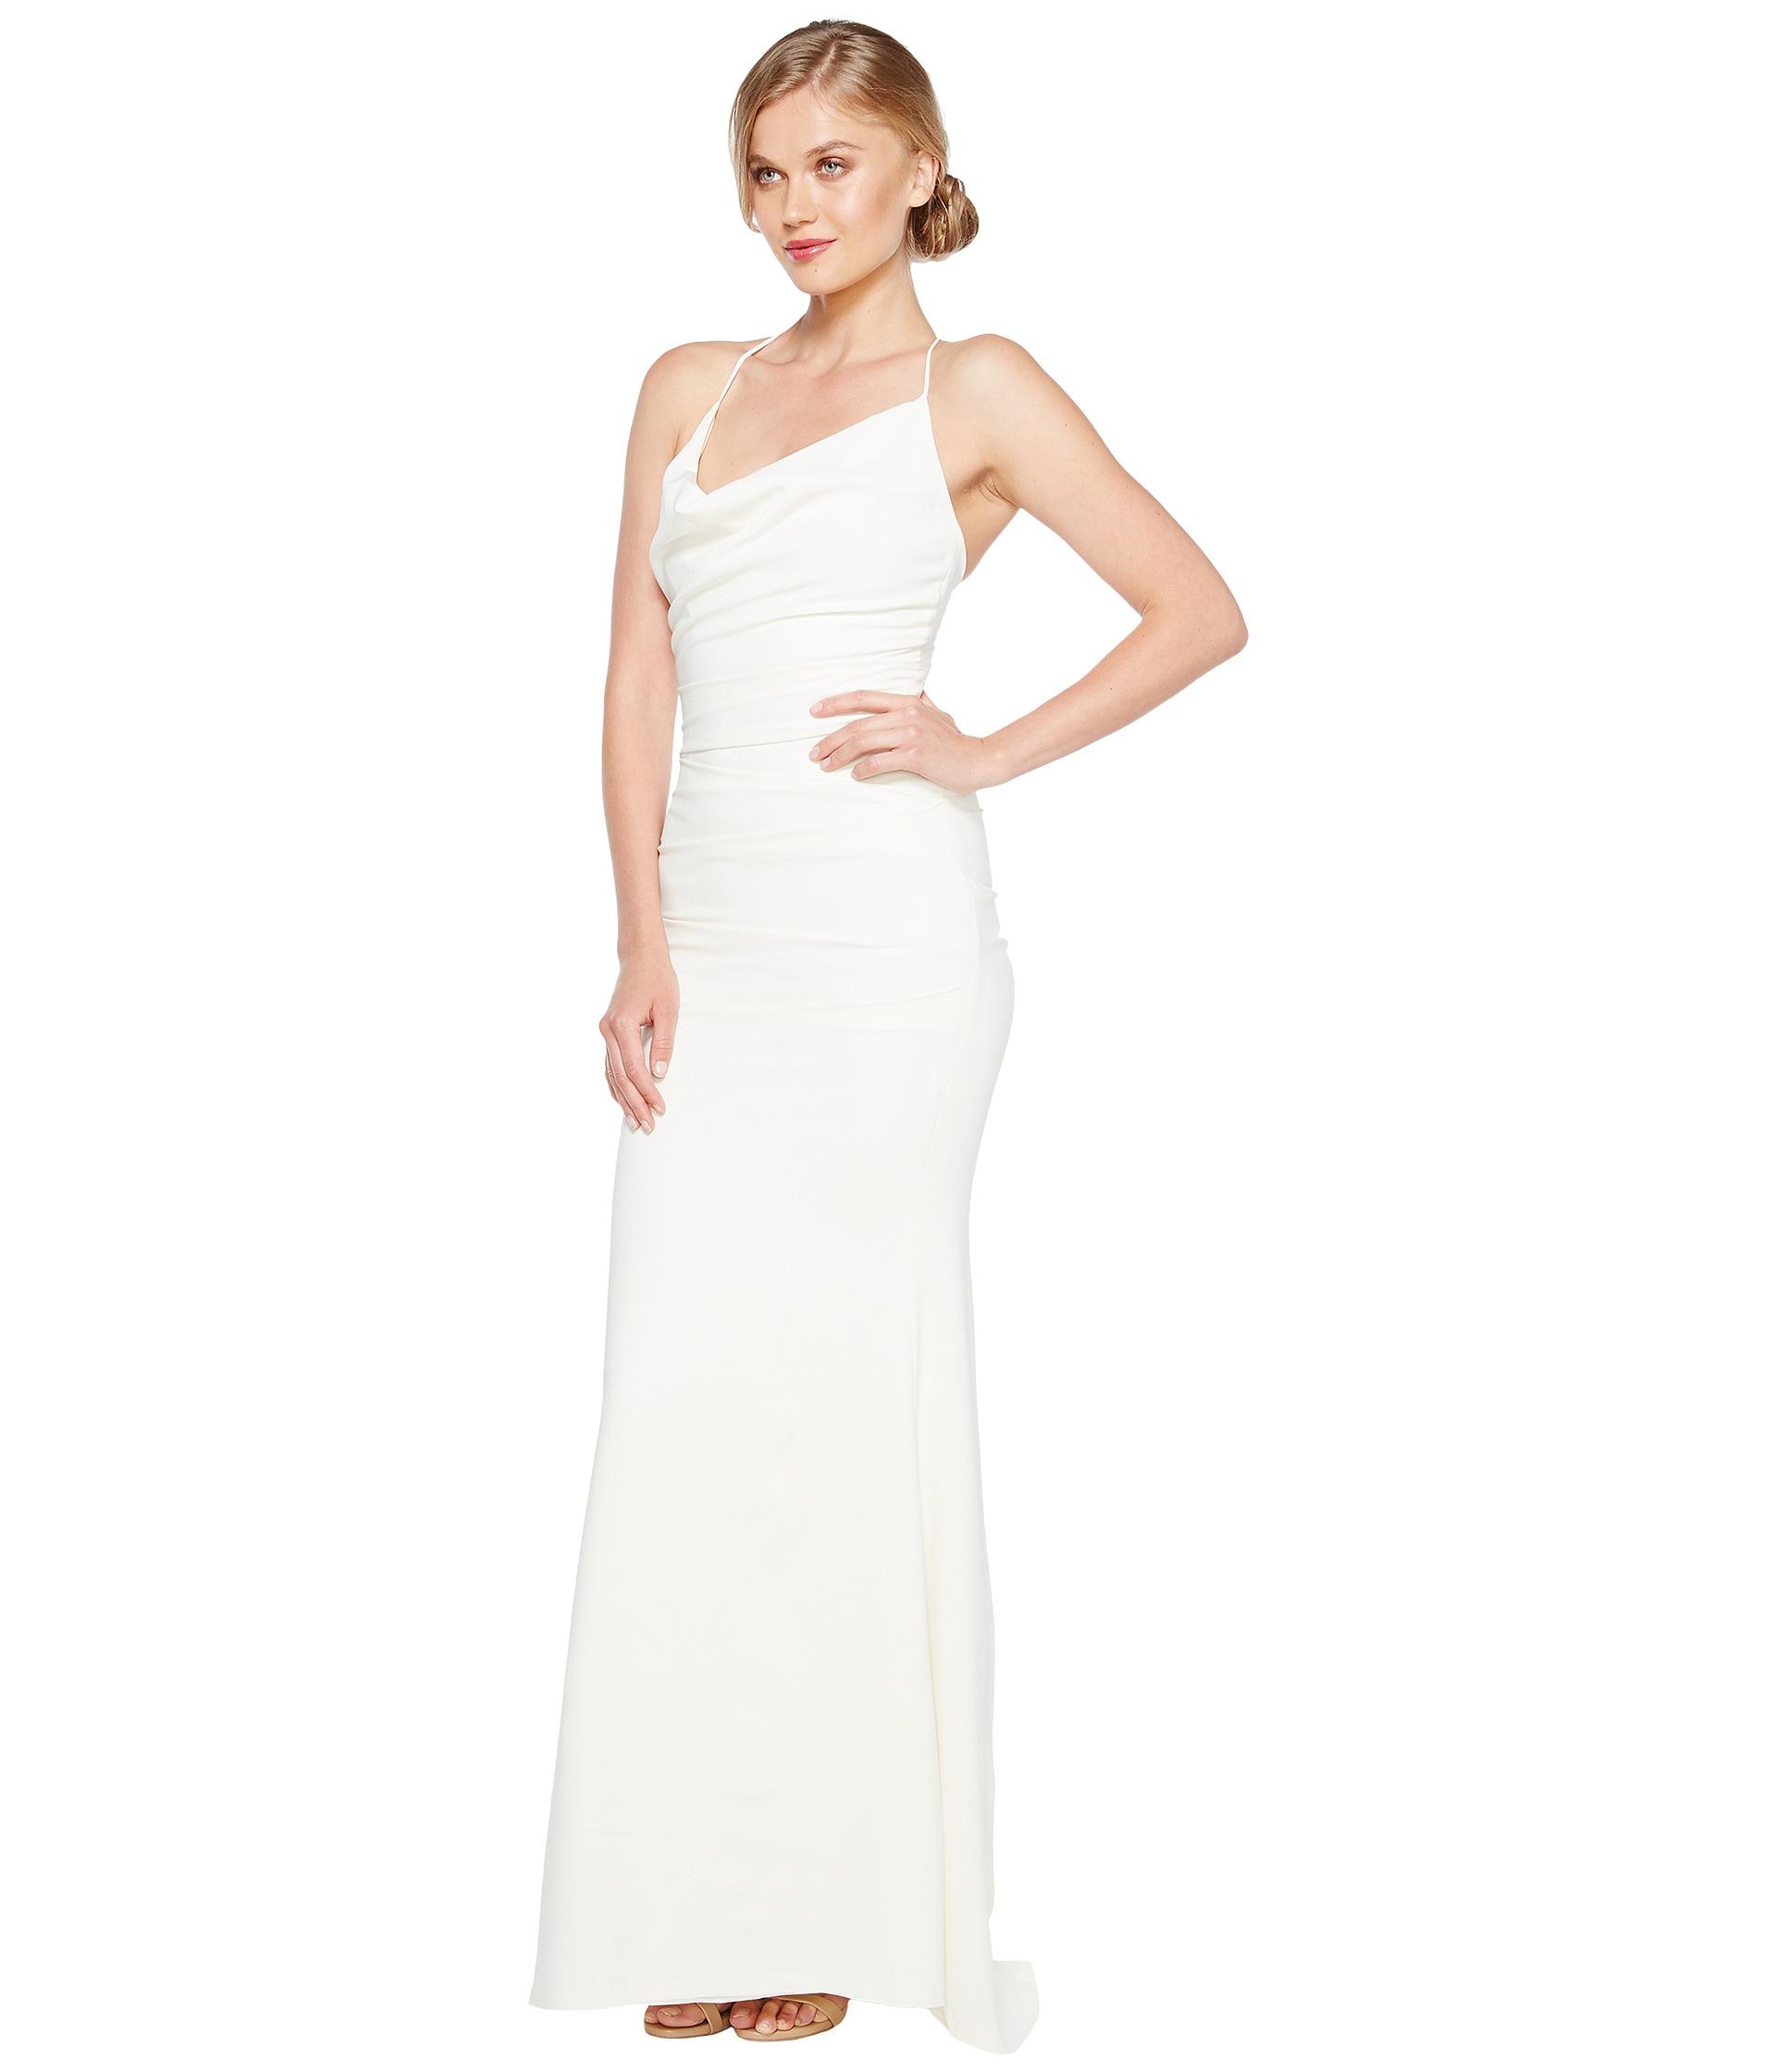 Nicole miller tara bridal gown zappos com free shipping both ways